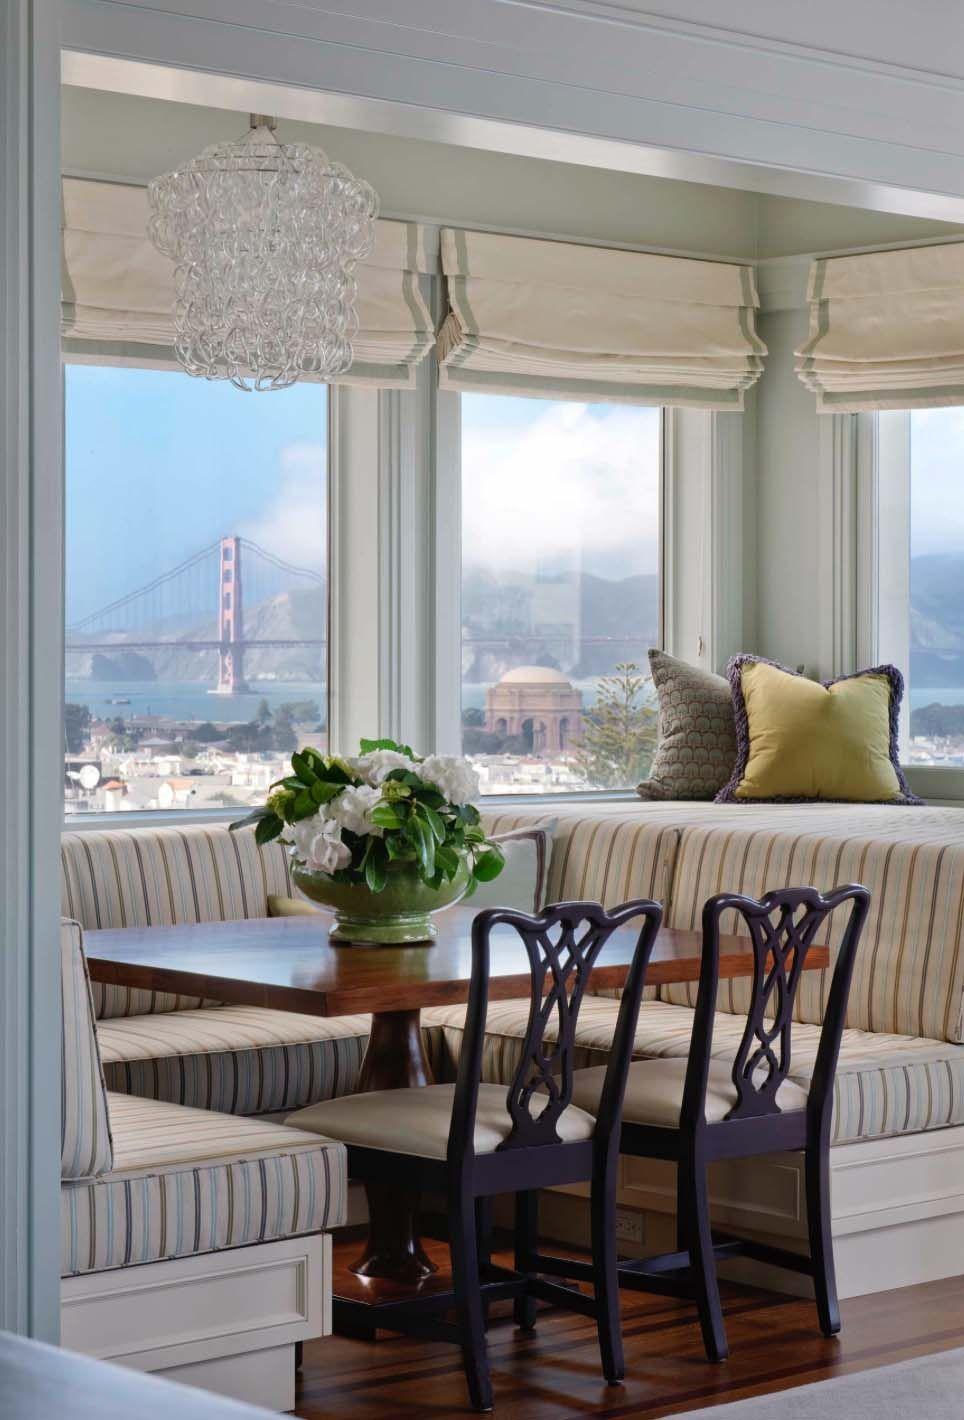 Kitchen nook window treatments   window nooks framing spectacular views  nook